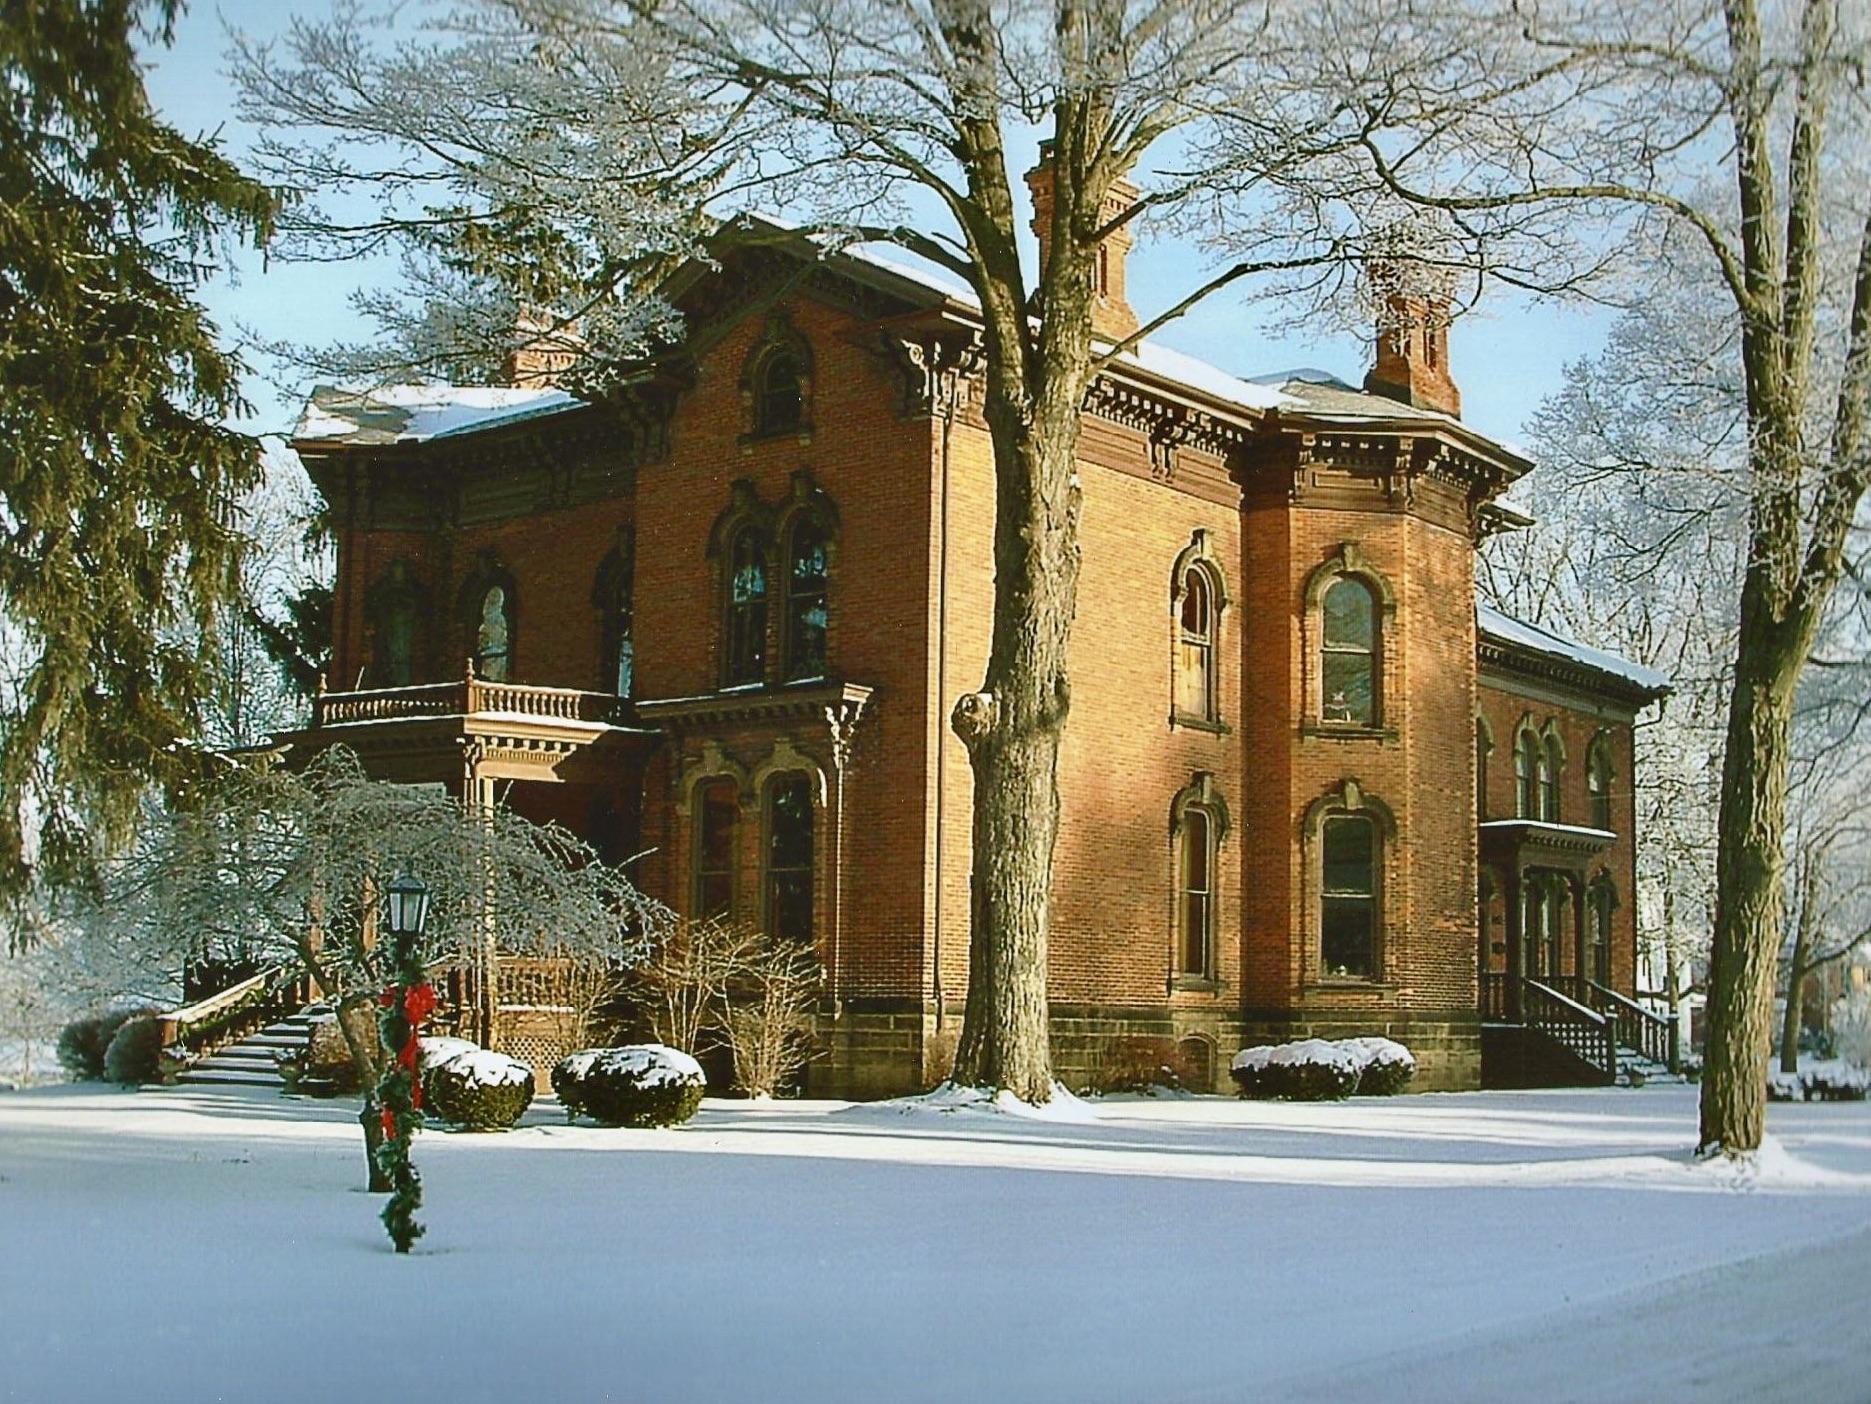 Grosvenor House Museum Halloween 2020 Grosvenor House Museum Board seeking funds for renovations